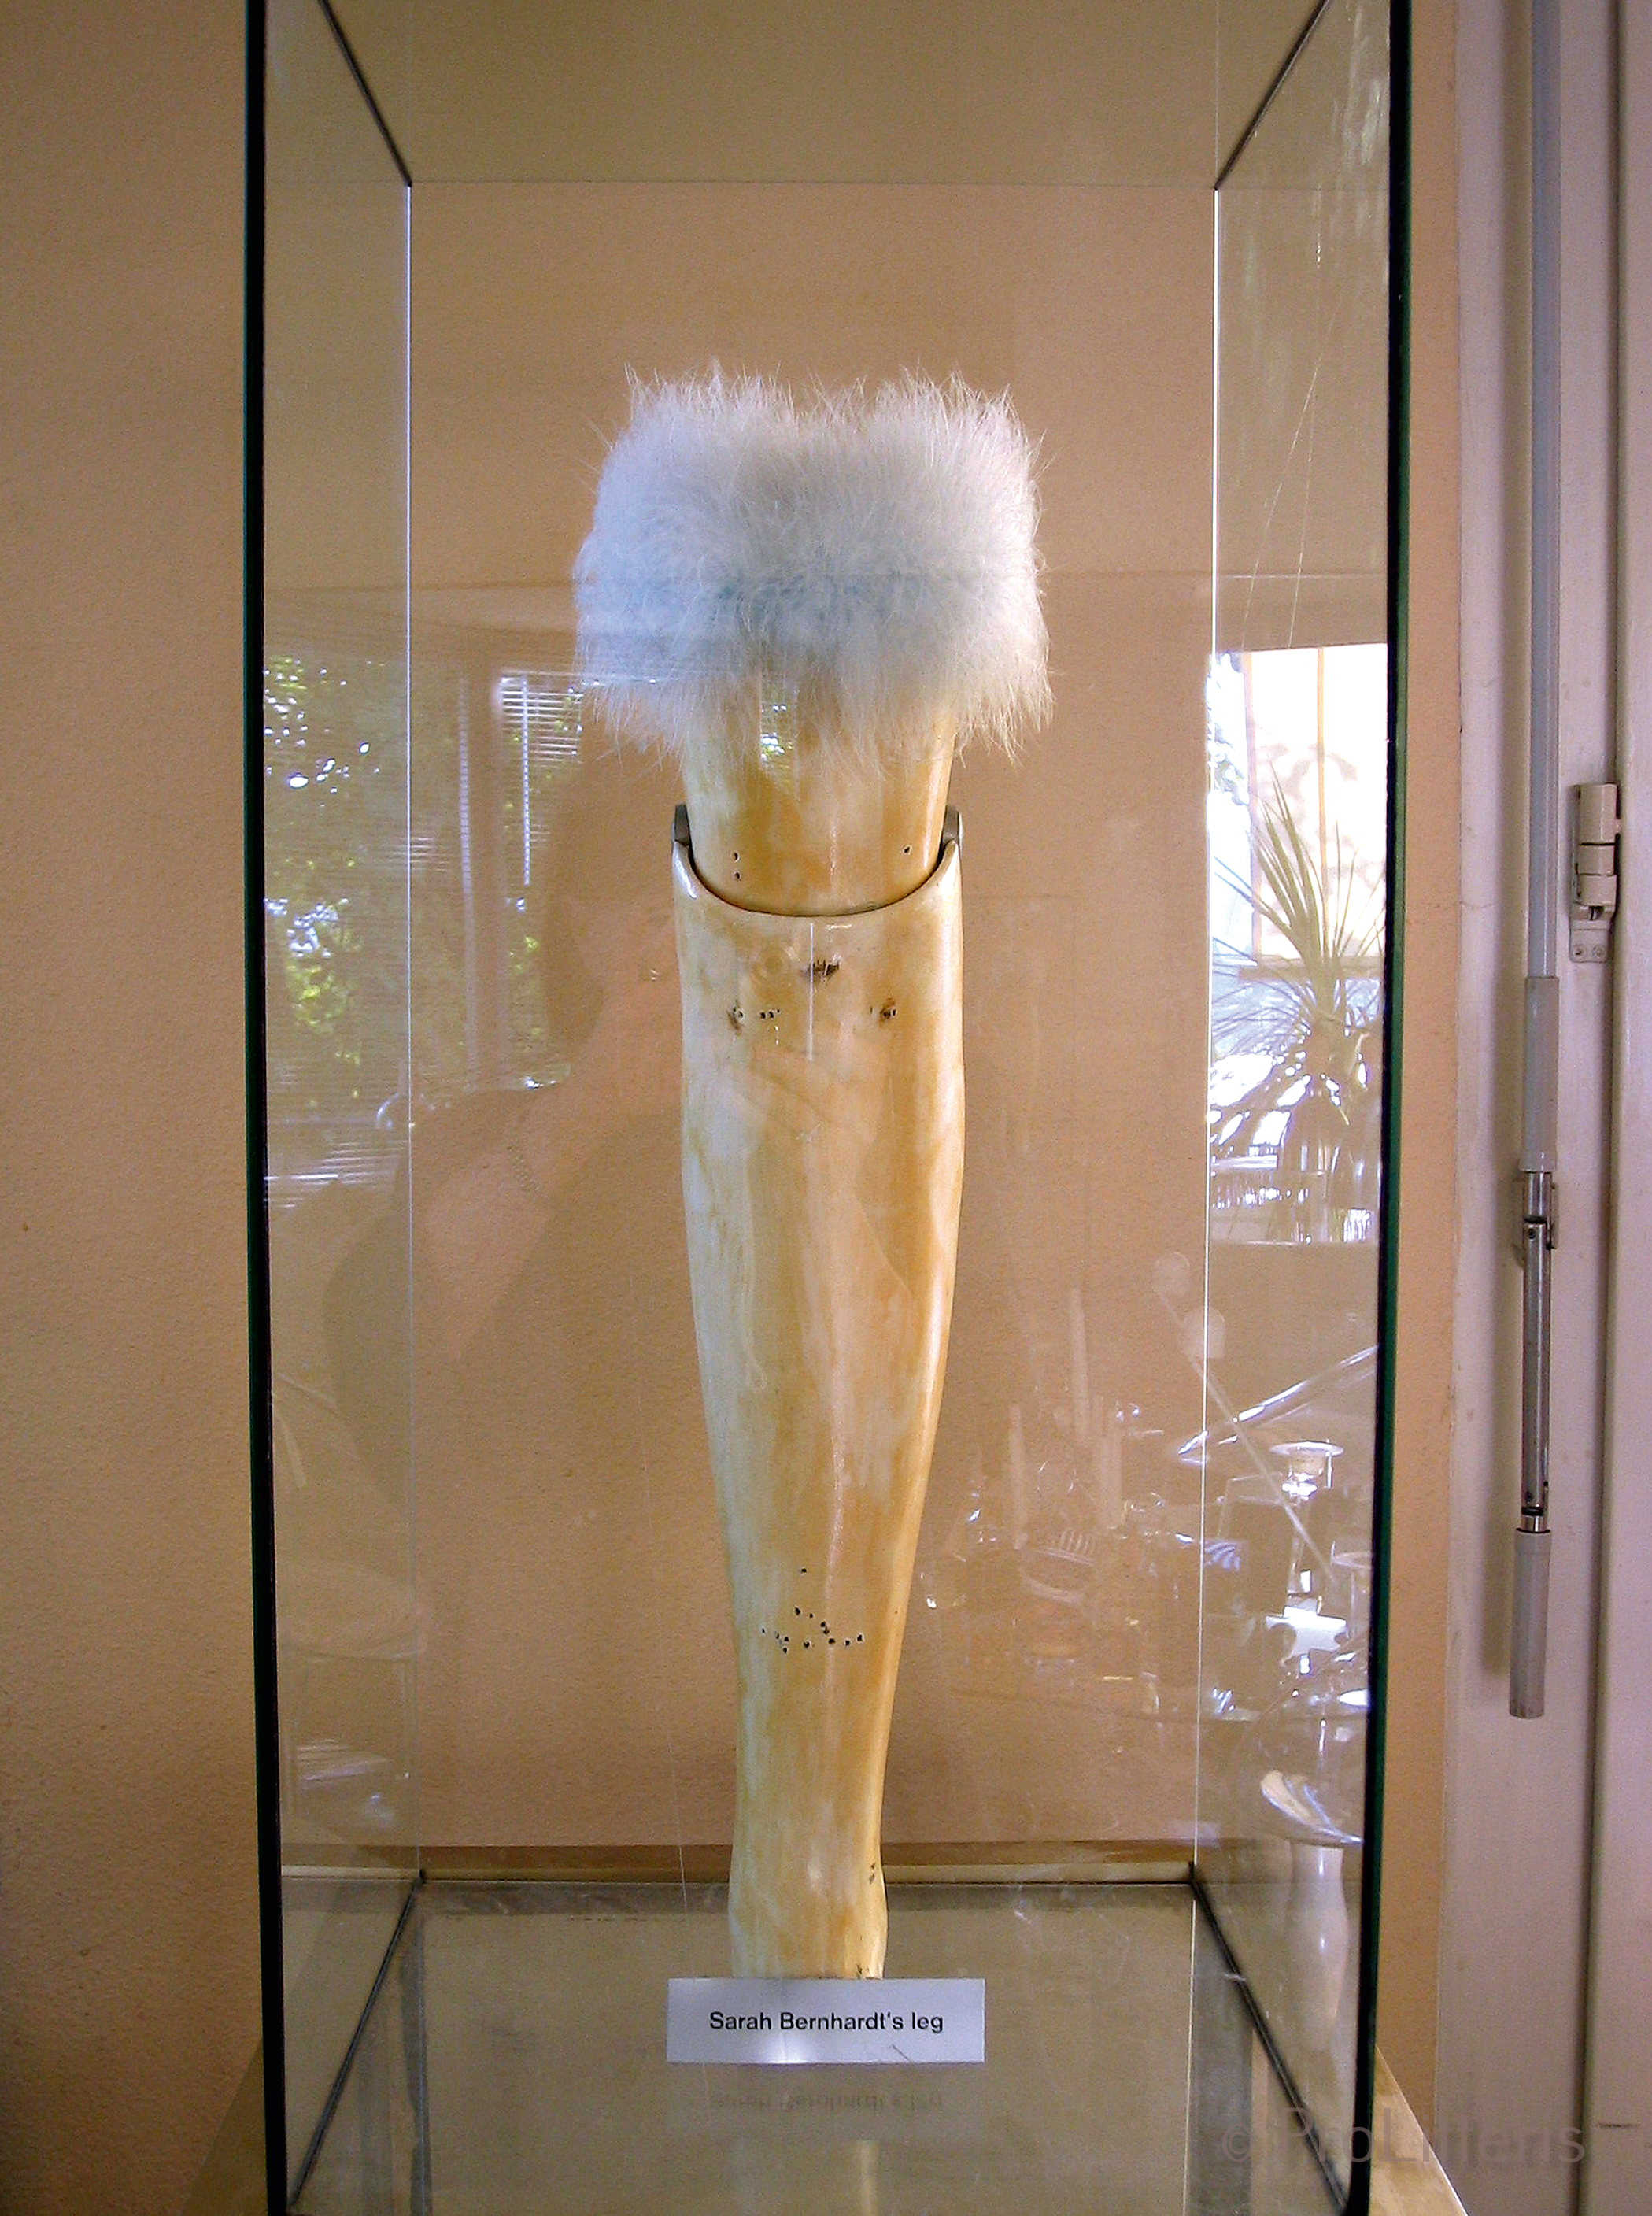 Sarah Bernhardt's Leg 1999